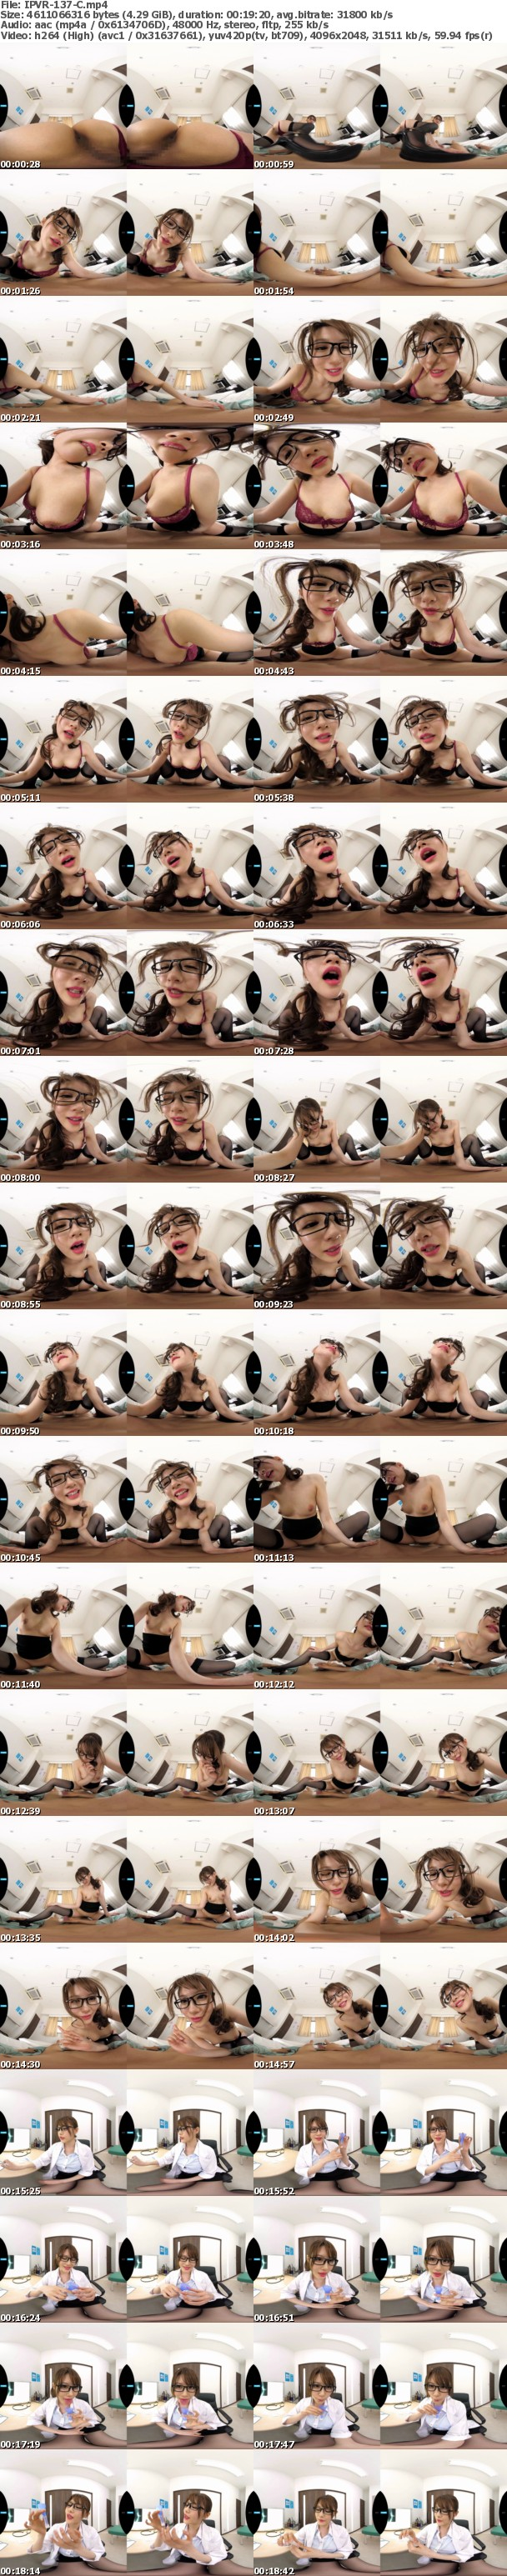 (VR) IPVR-137 【ASMR淫語】 痴女医のおち○ぽ転がし射精管理VR 美とエロがテーマに撮影!乳首舐め手コキ・性感帯いじりフェラ・密着騎乗位!焦らし・寸止め…なかなかイカせてくれないイジワルなみなみ先生にドハマり中!! 相沢みなみ